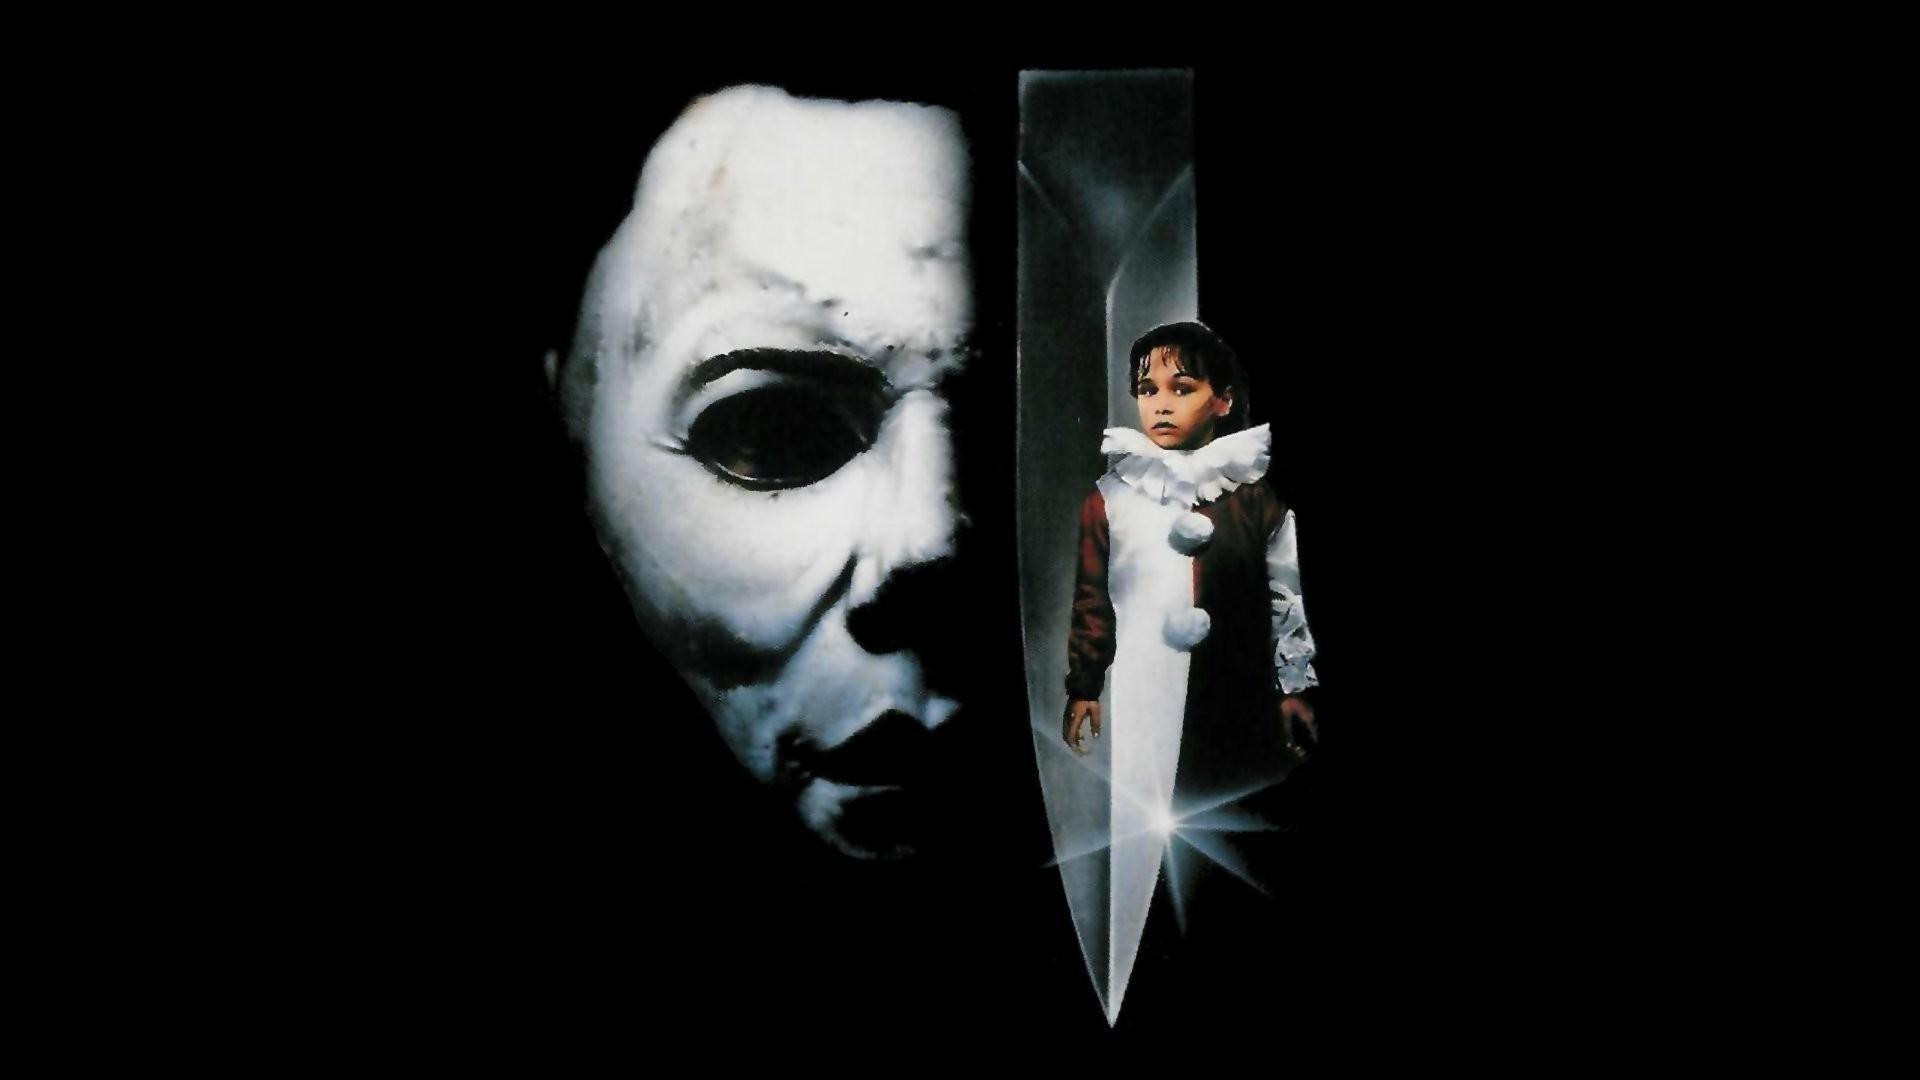 1920x1080 Halloween 6 The Curse Of Michael Myers Producers Cut Sneak Peek